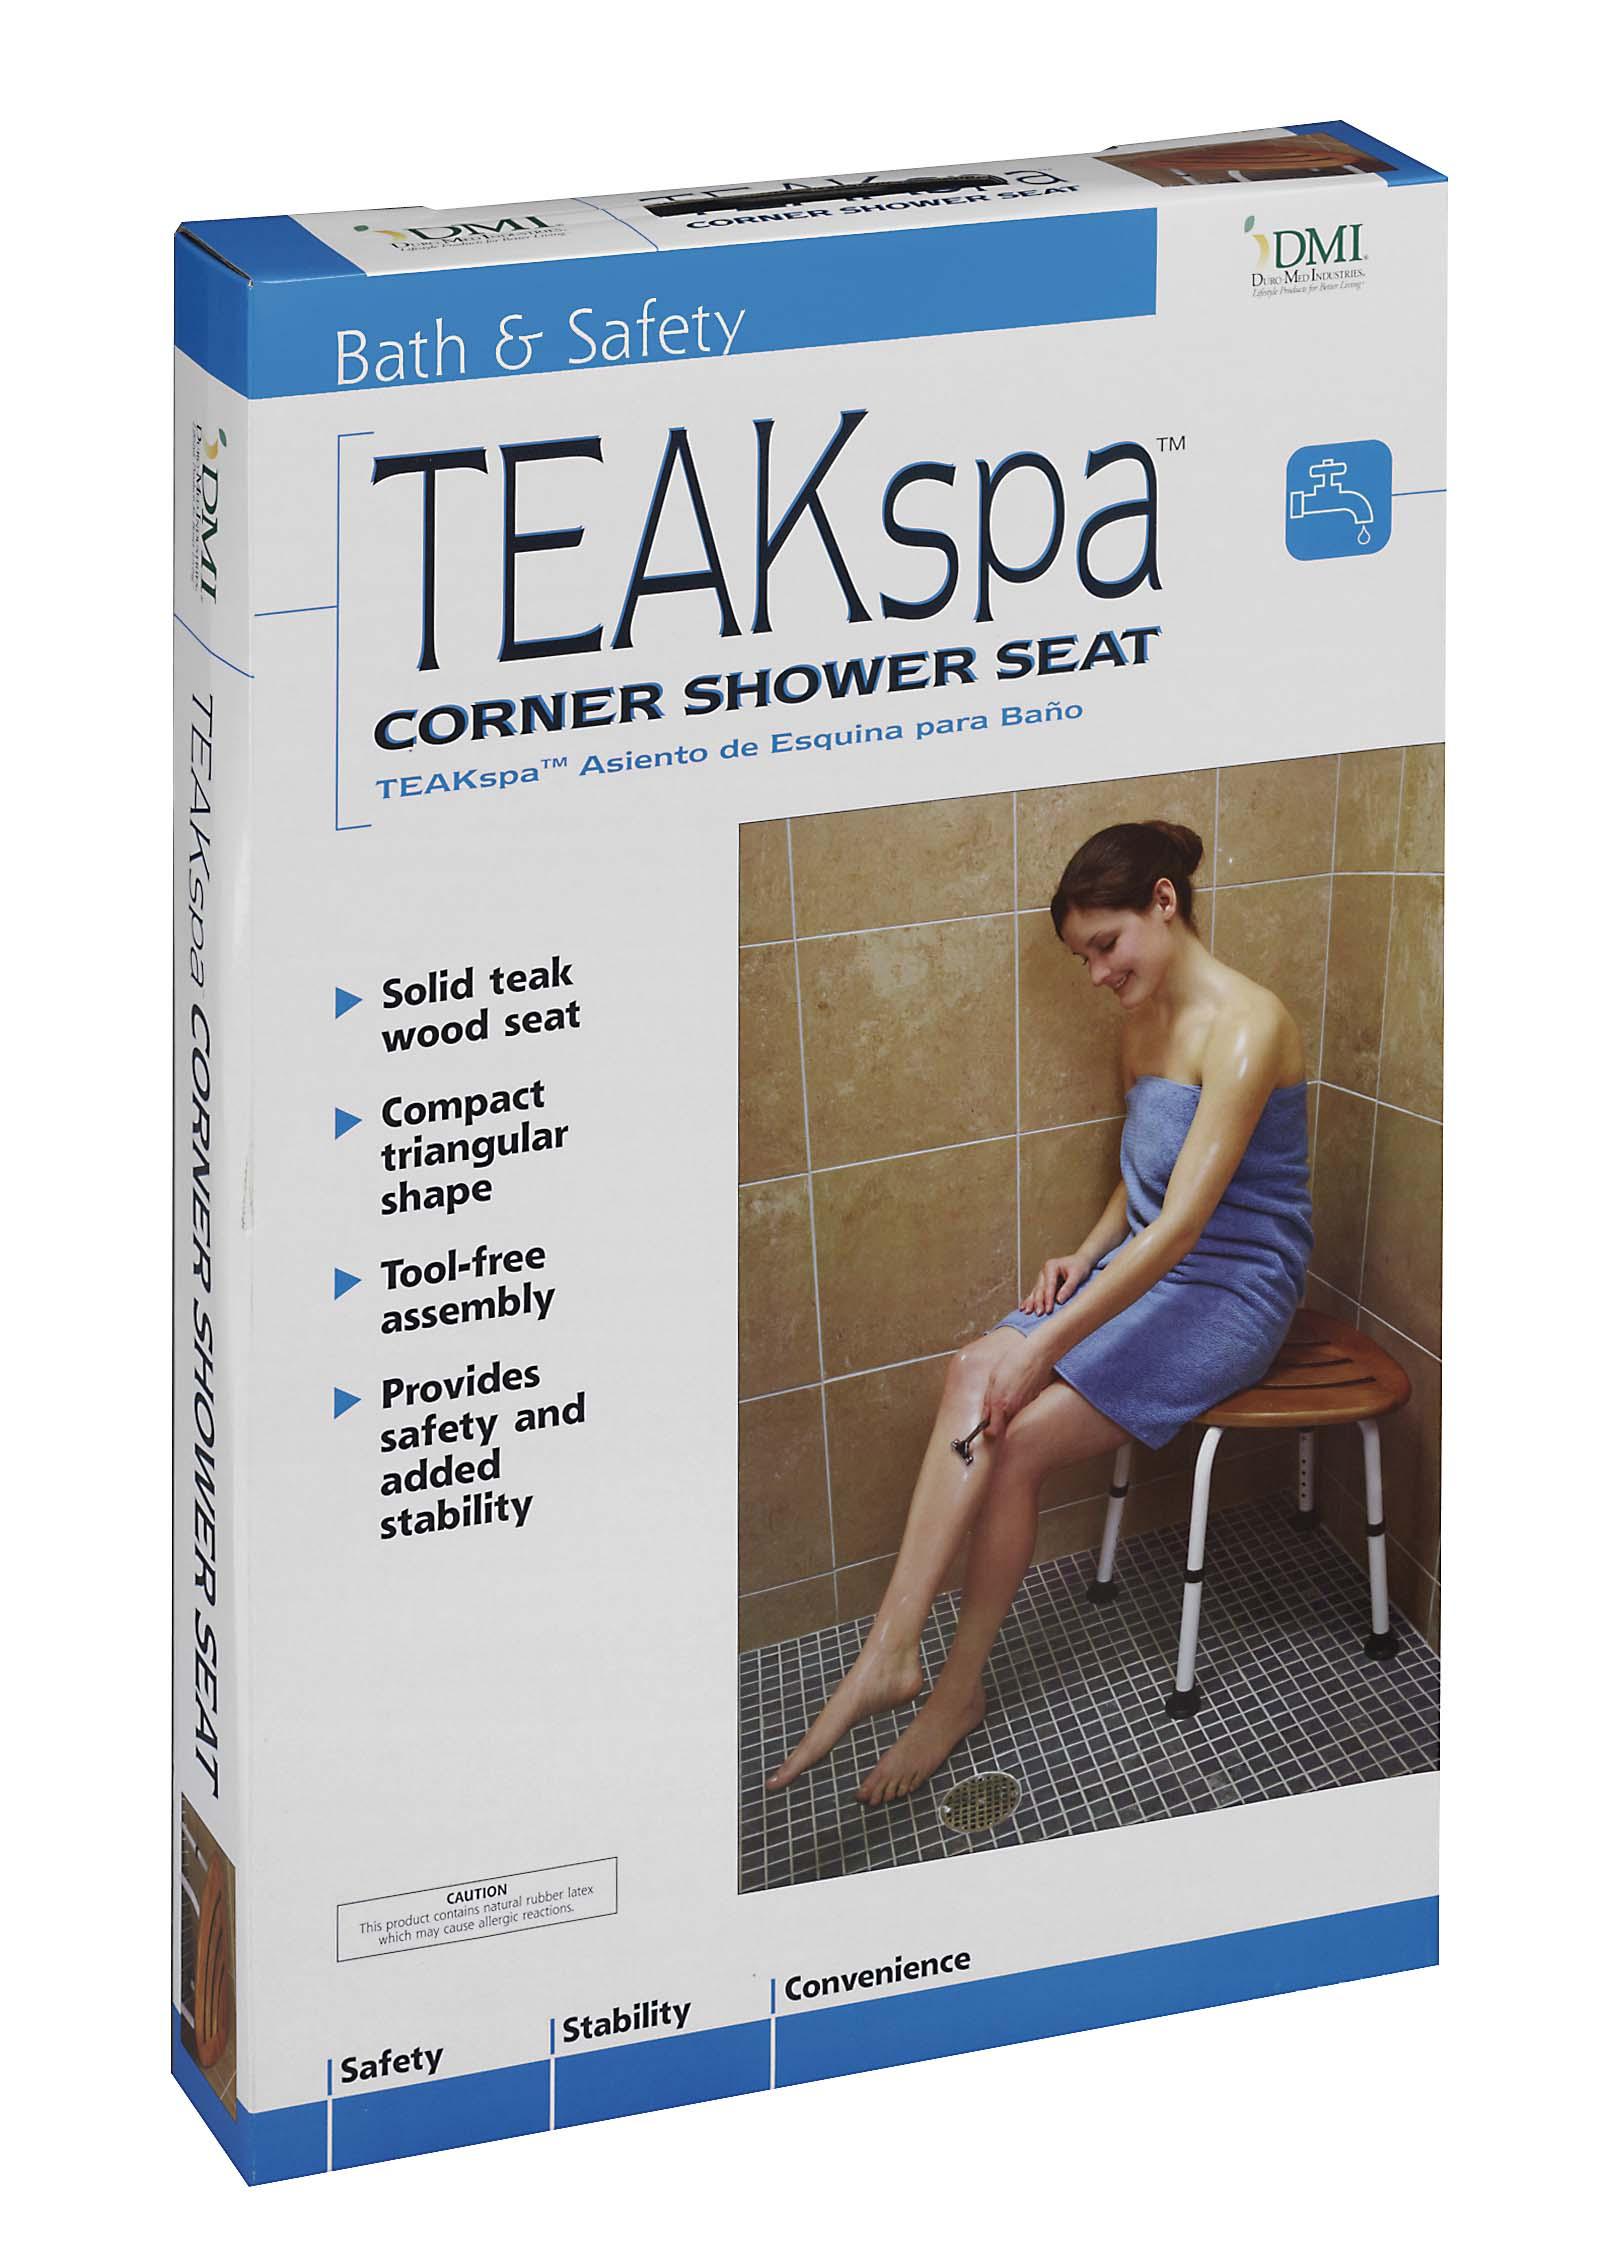 teakspa-corner-shower-seat-522-1703-6399-lr-2.jpg